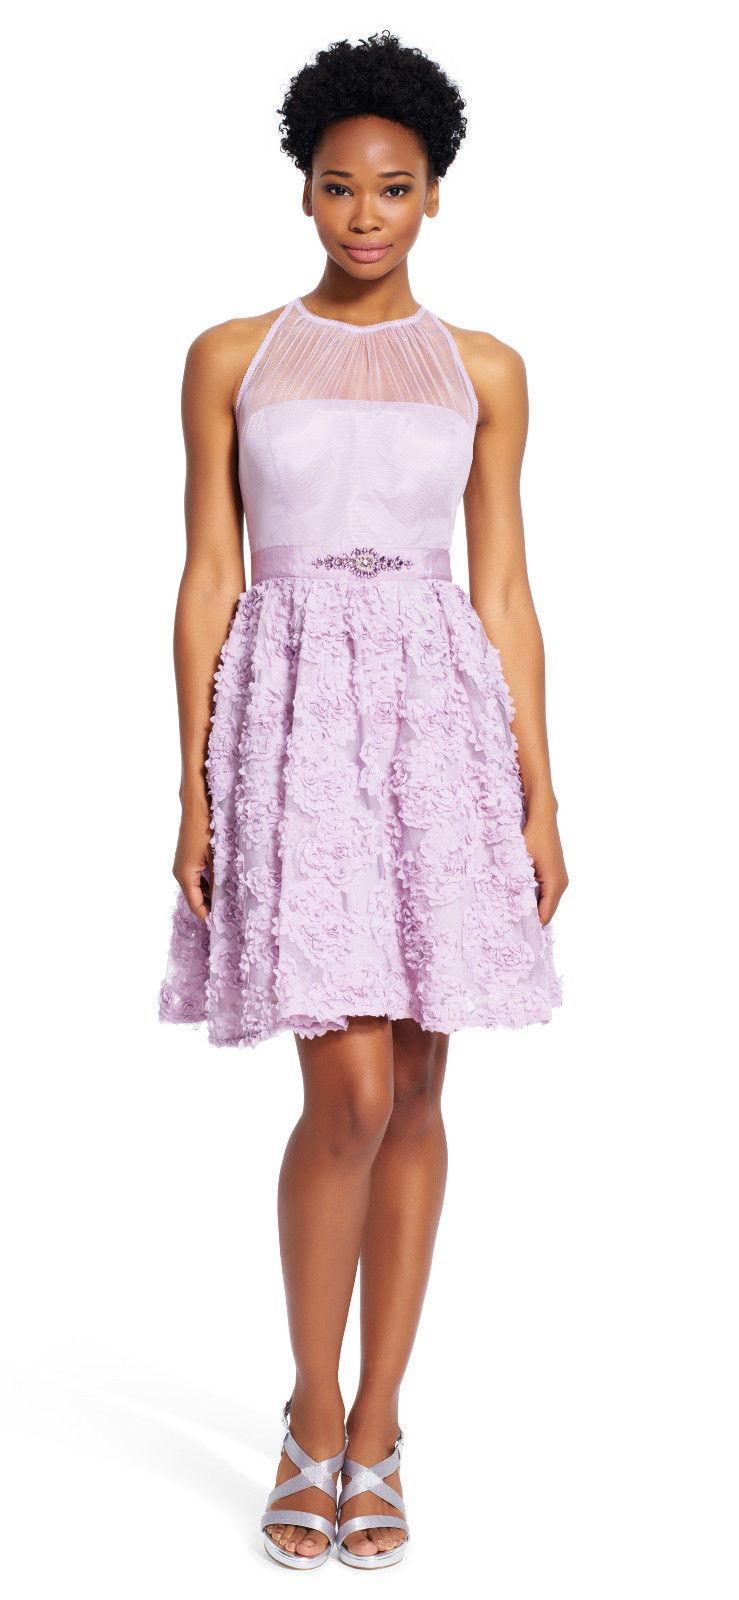 Adrianna Papell New Womens Light Heather Petal Chiffon Halter Dress  12